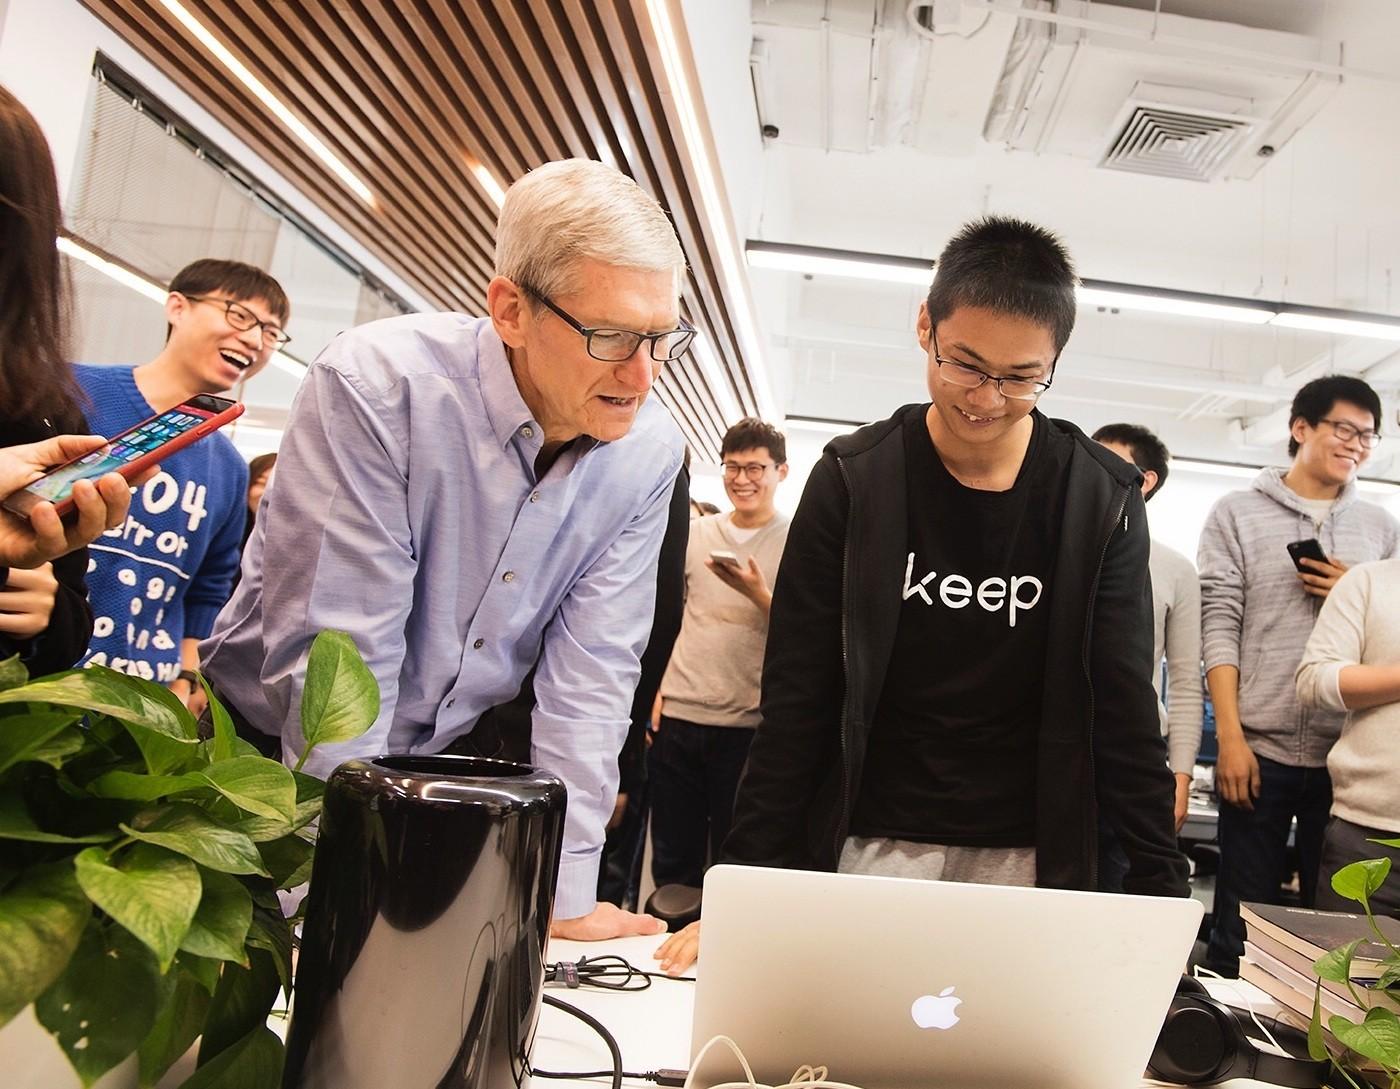 Tim Cook visits Keep, China startup